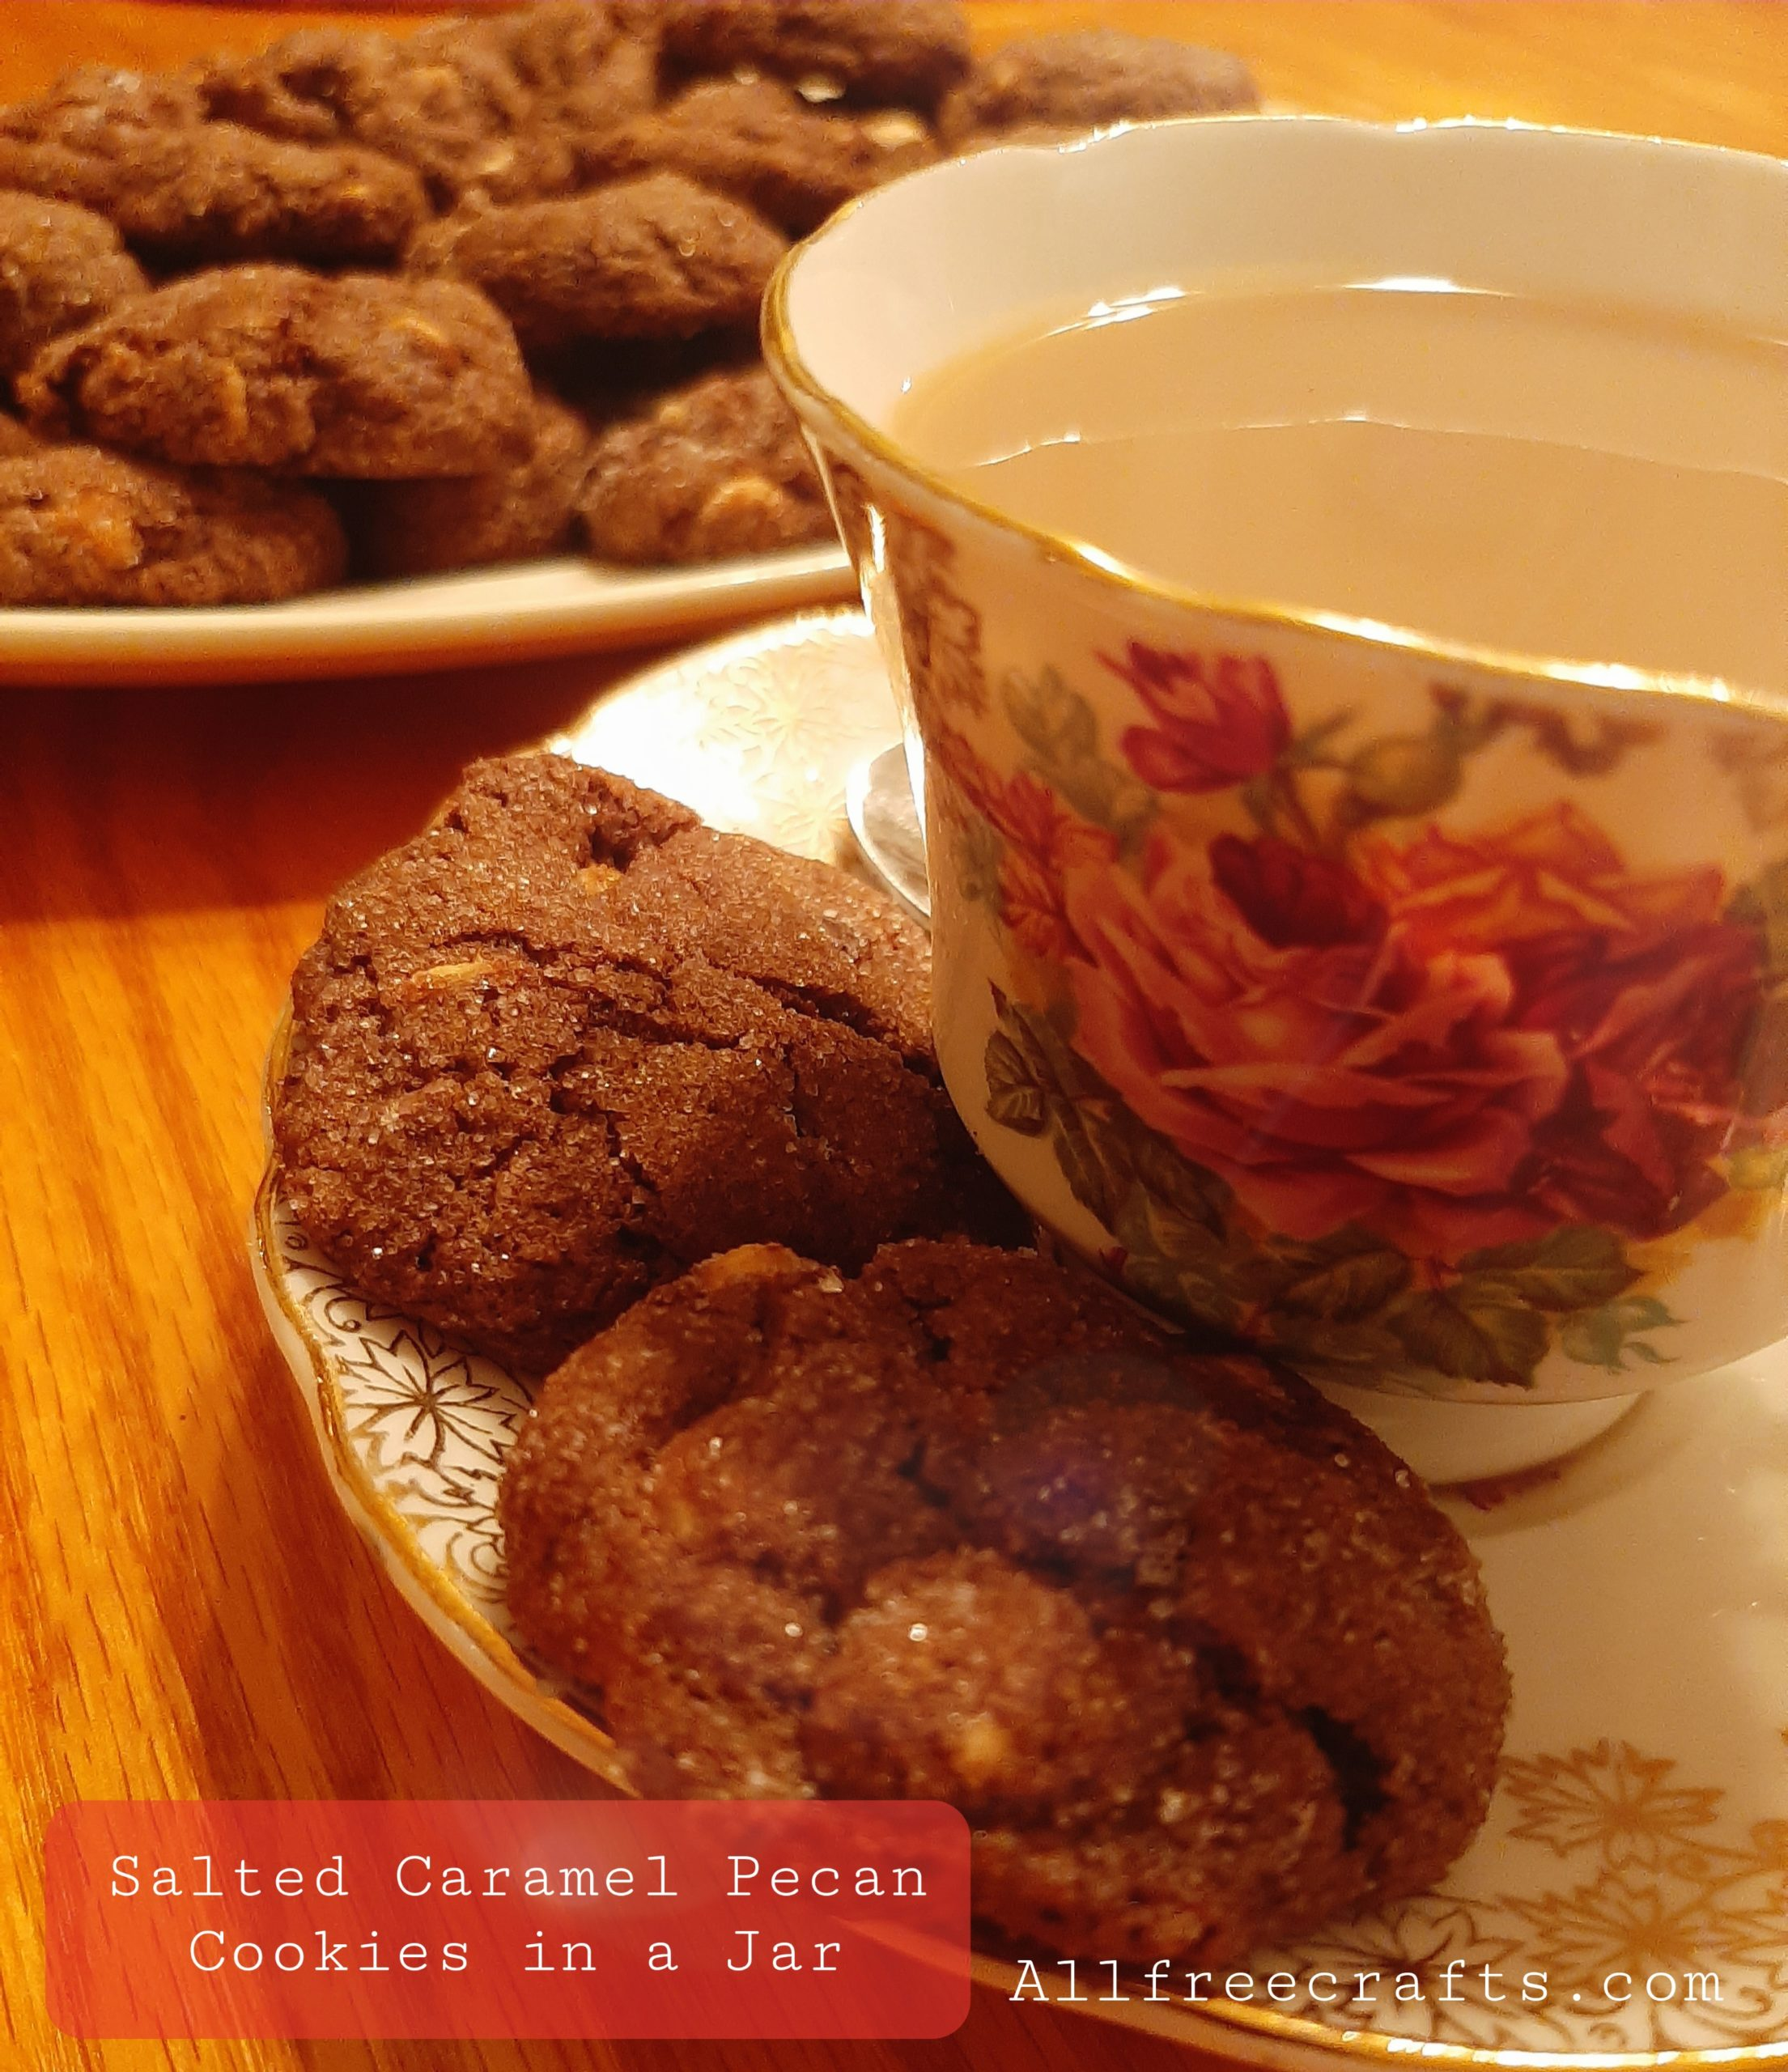 salted caramel pecan cookies with a cup of tea